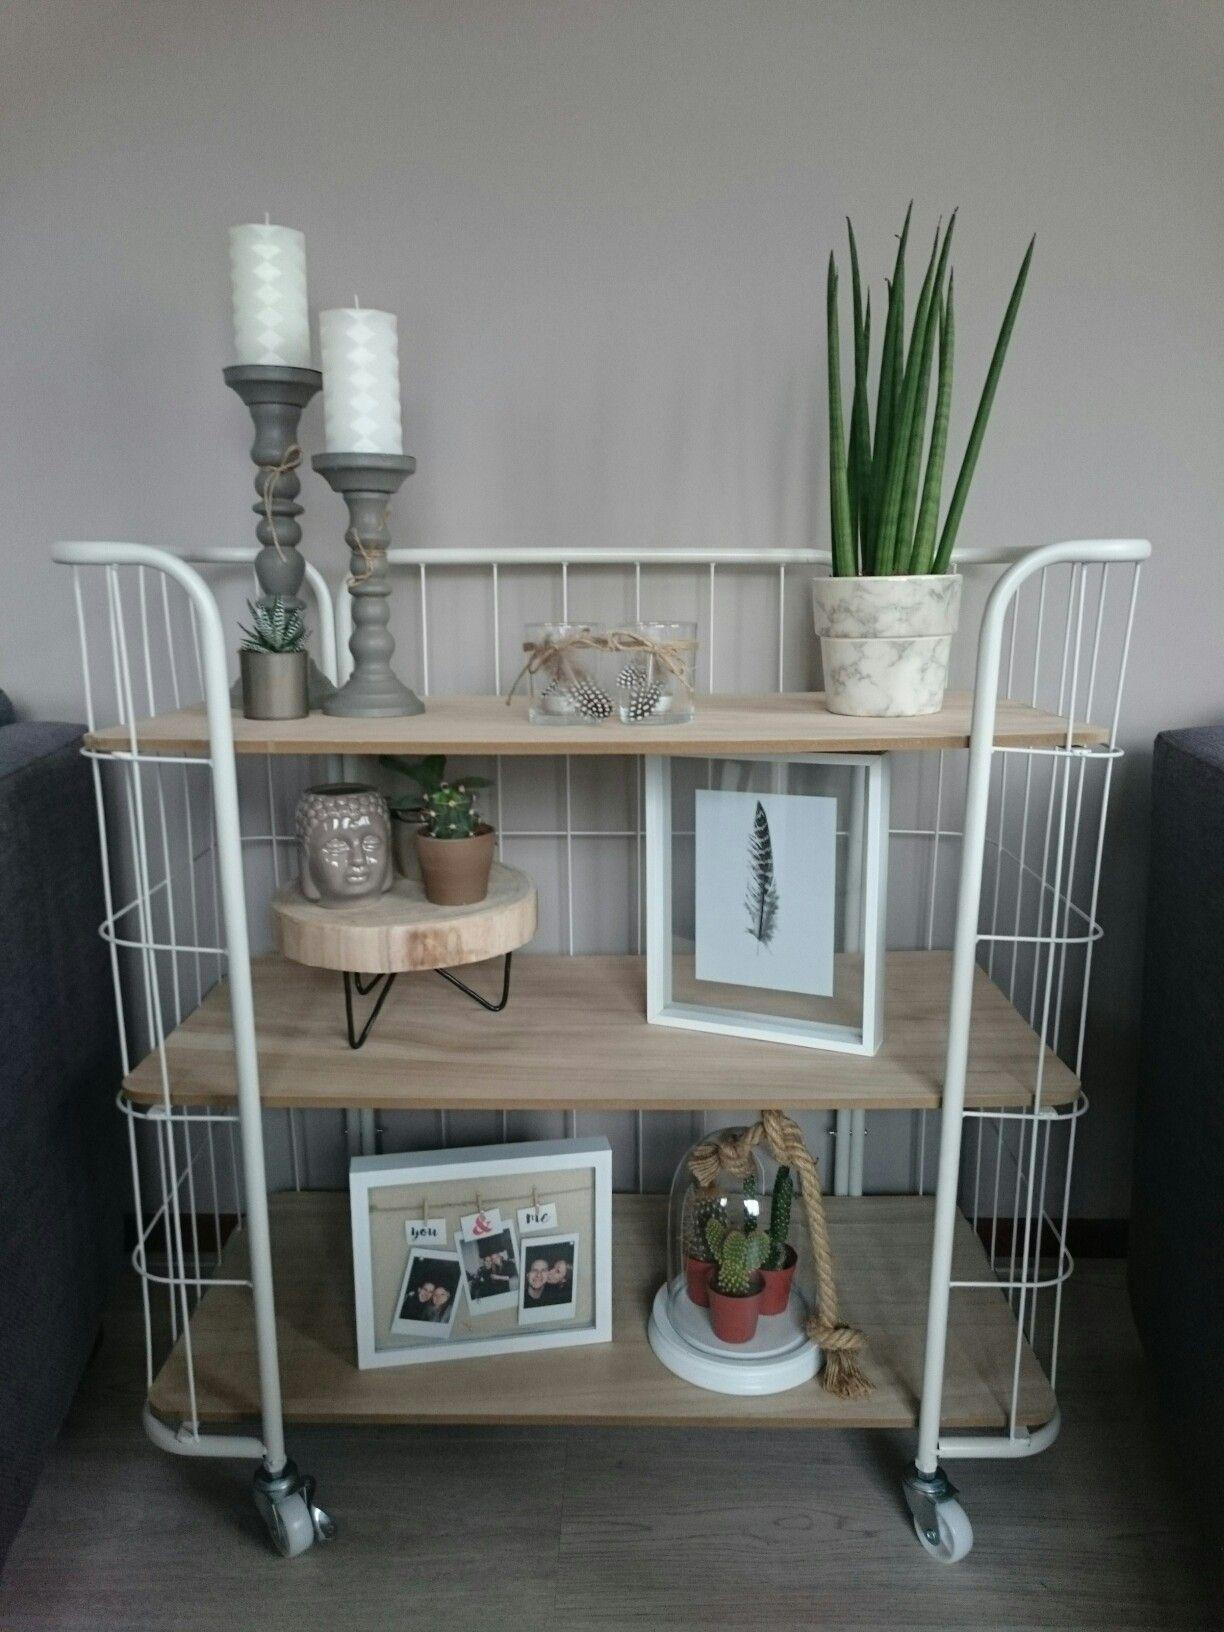 bakkerskast #xenos - Bakkerskast | Pinterest - Huiskamer, Decoratie ...